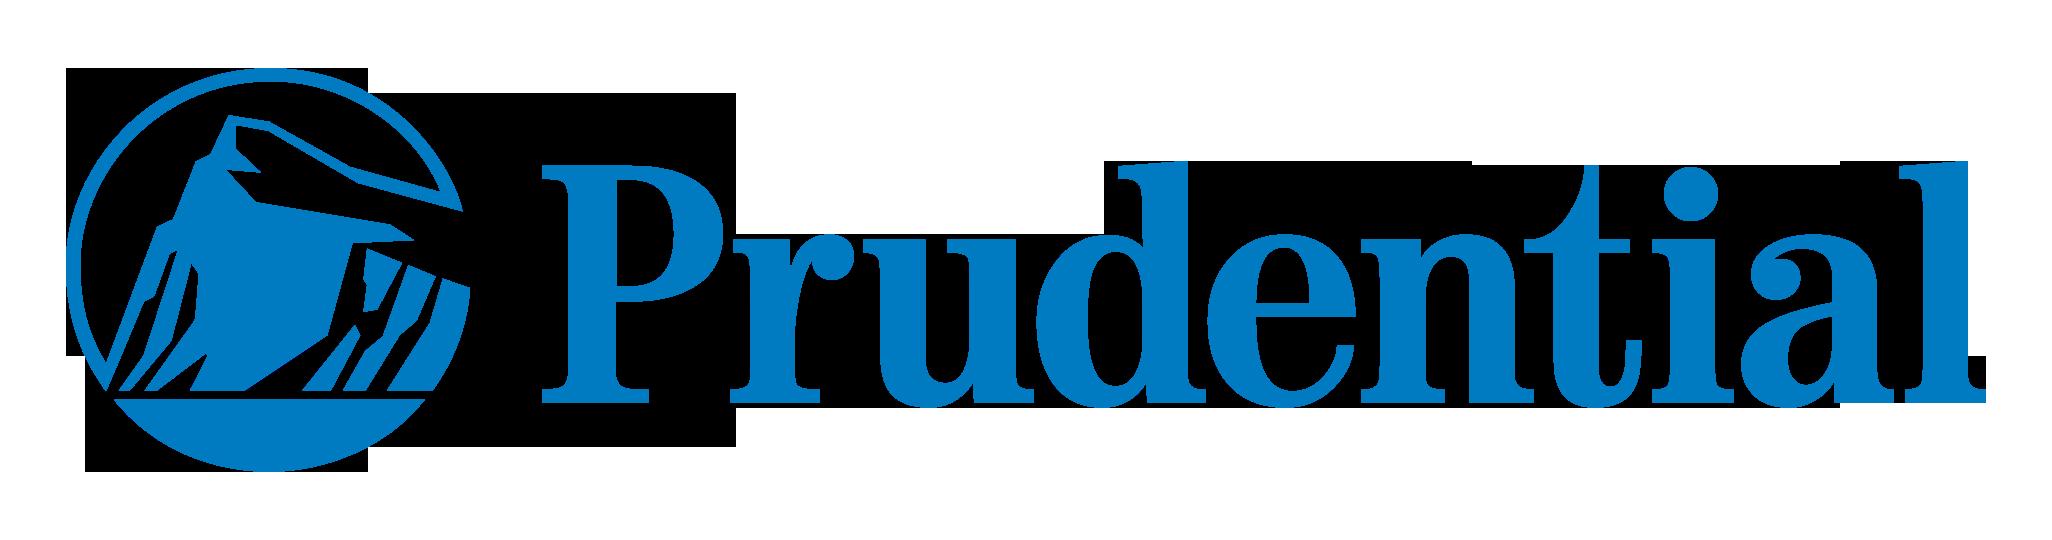 PNGPIX-COM-Prudential-Logo-PNG-Transparent-1